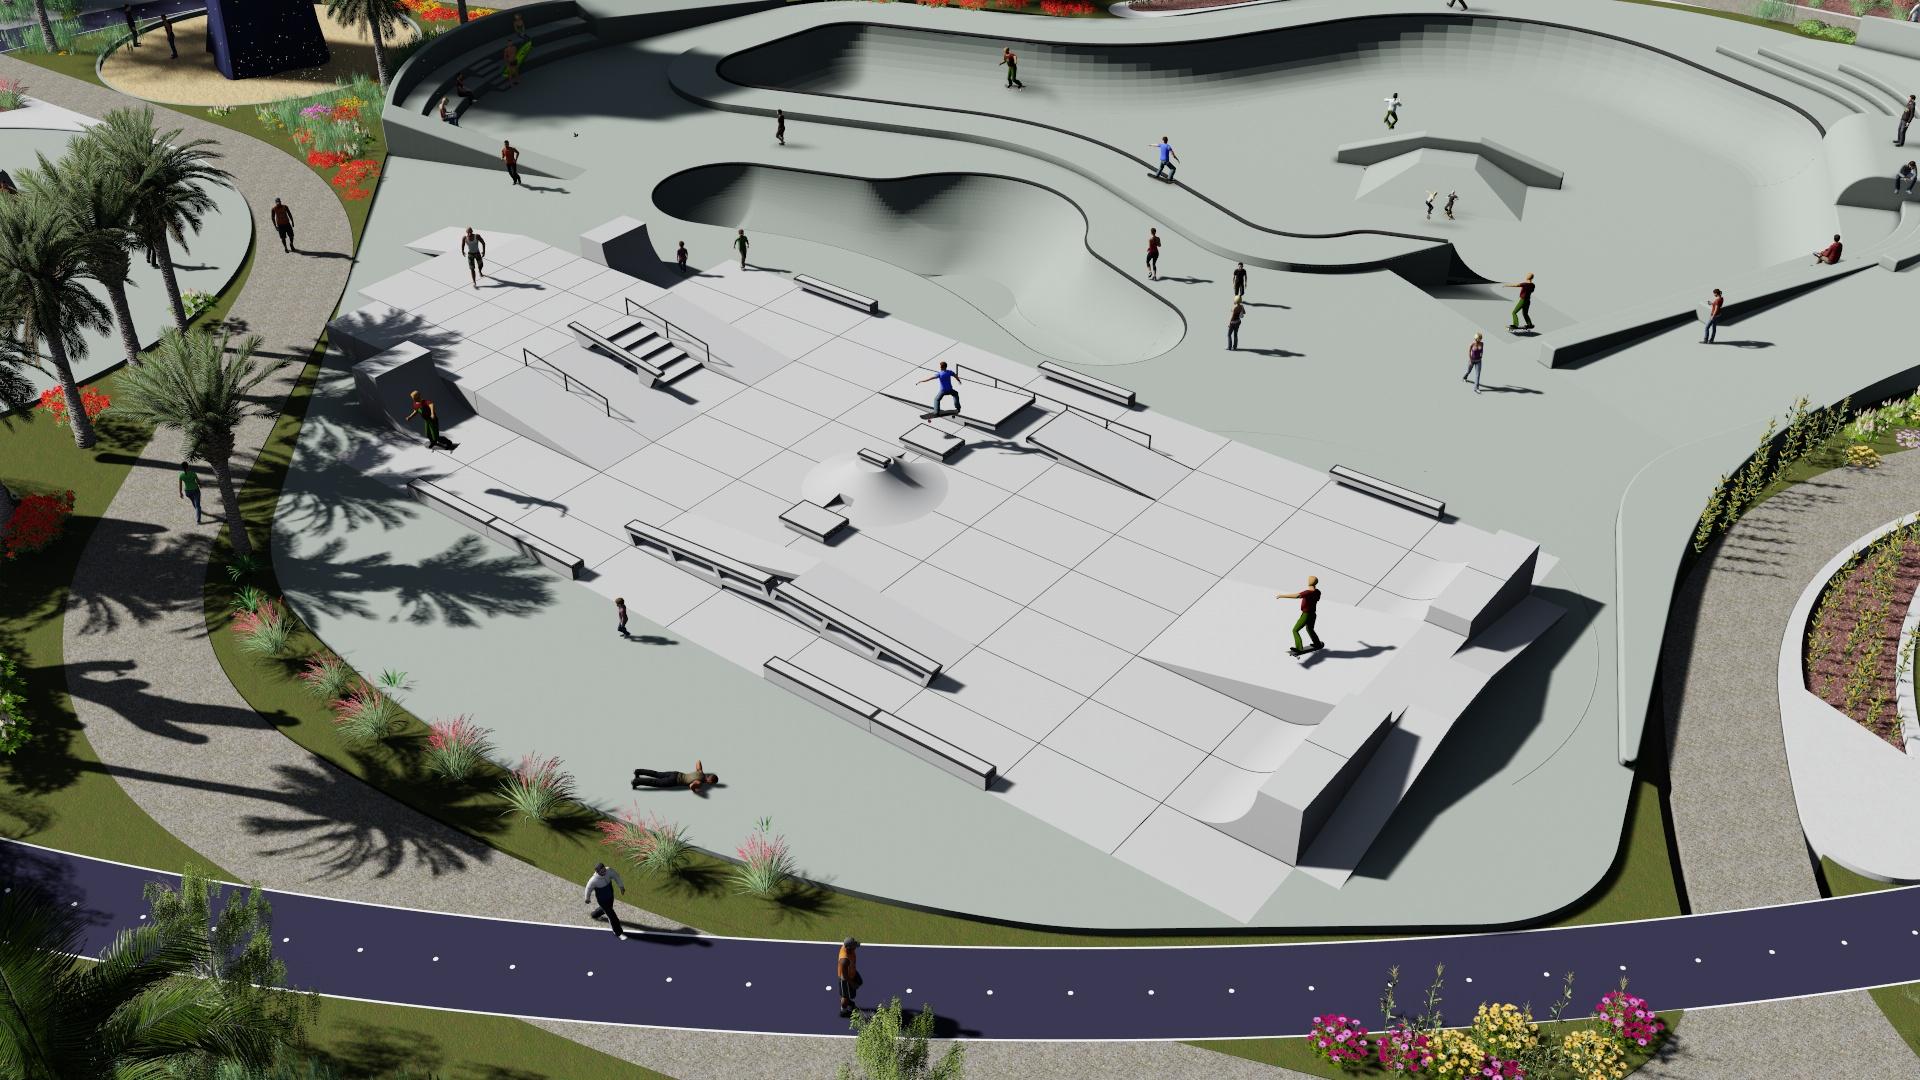 Maspalomas modernizará su Skatepark con 340.000 euros